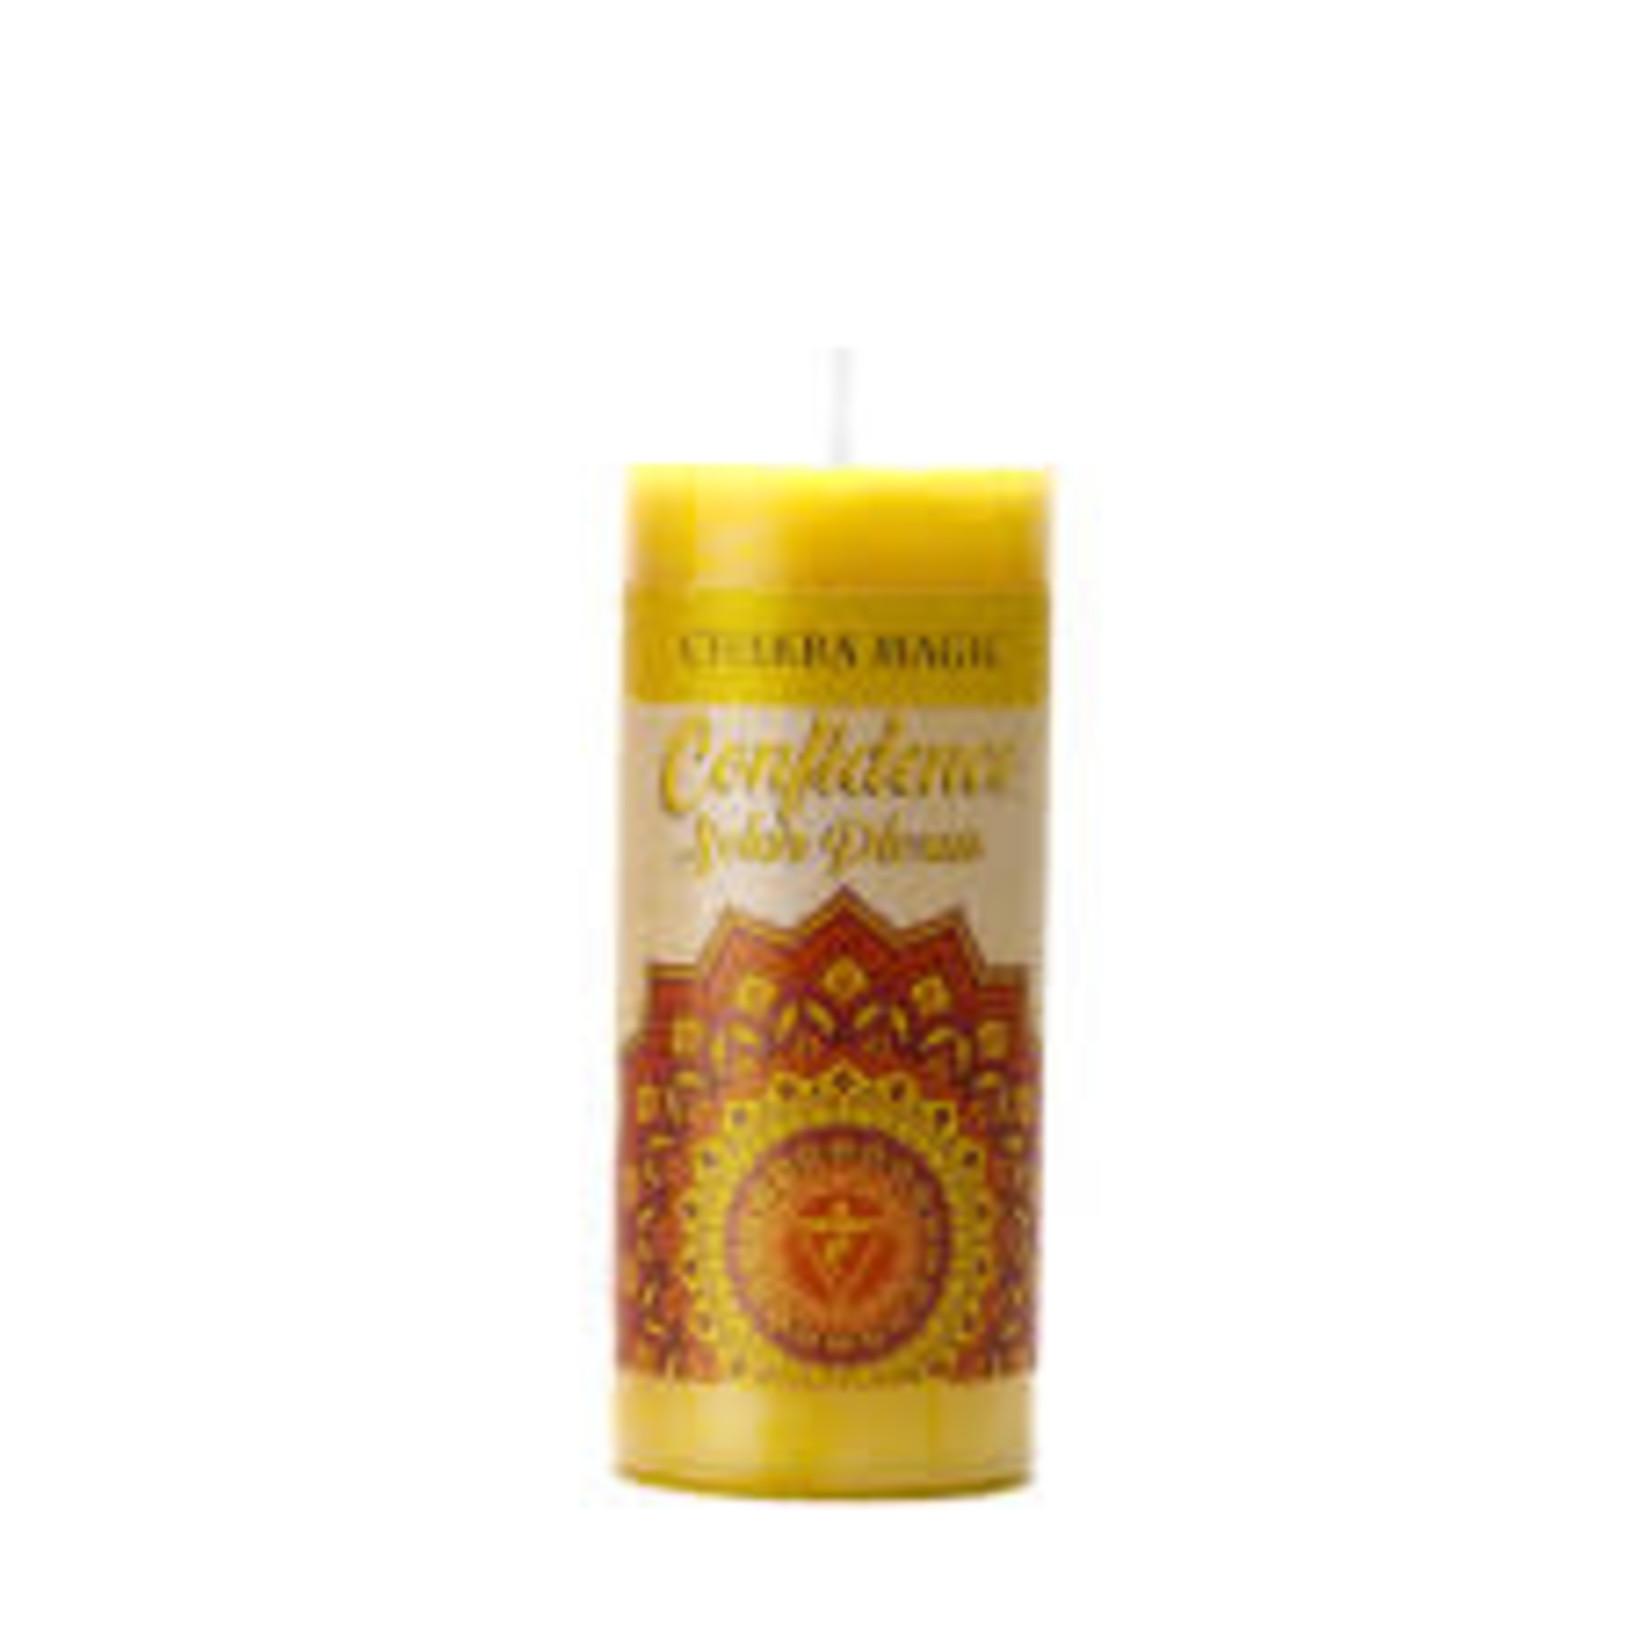 Chakra Magic: Solar Plexus (Confidence) Candle